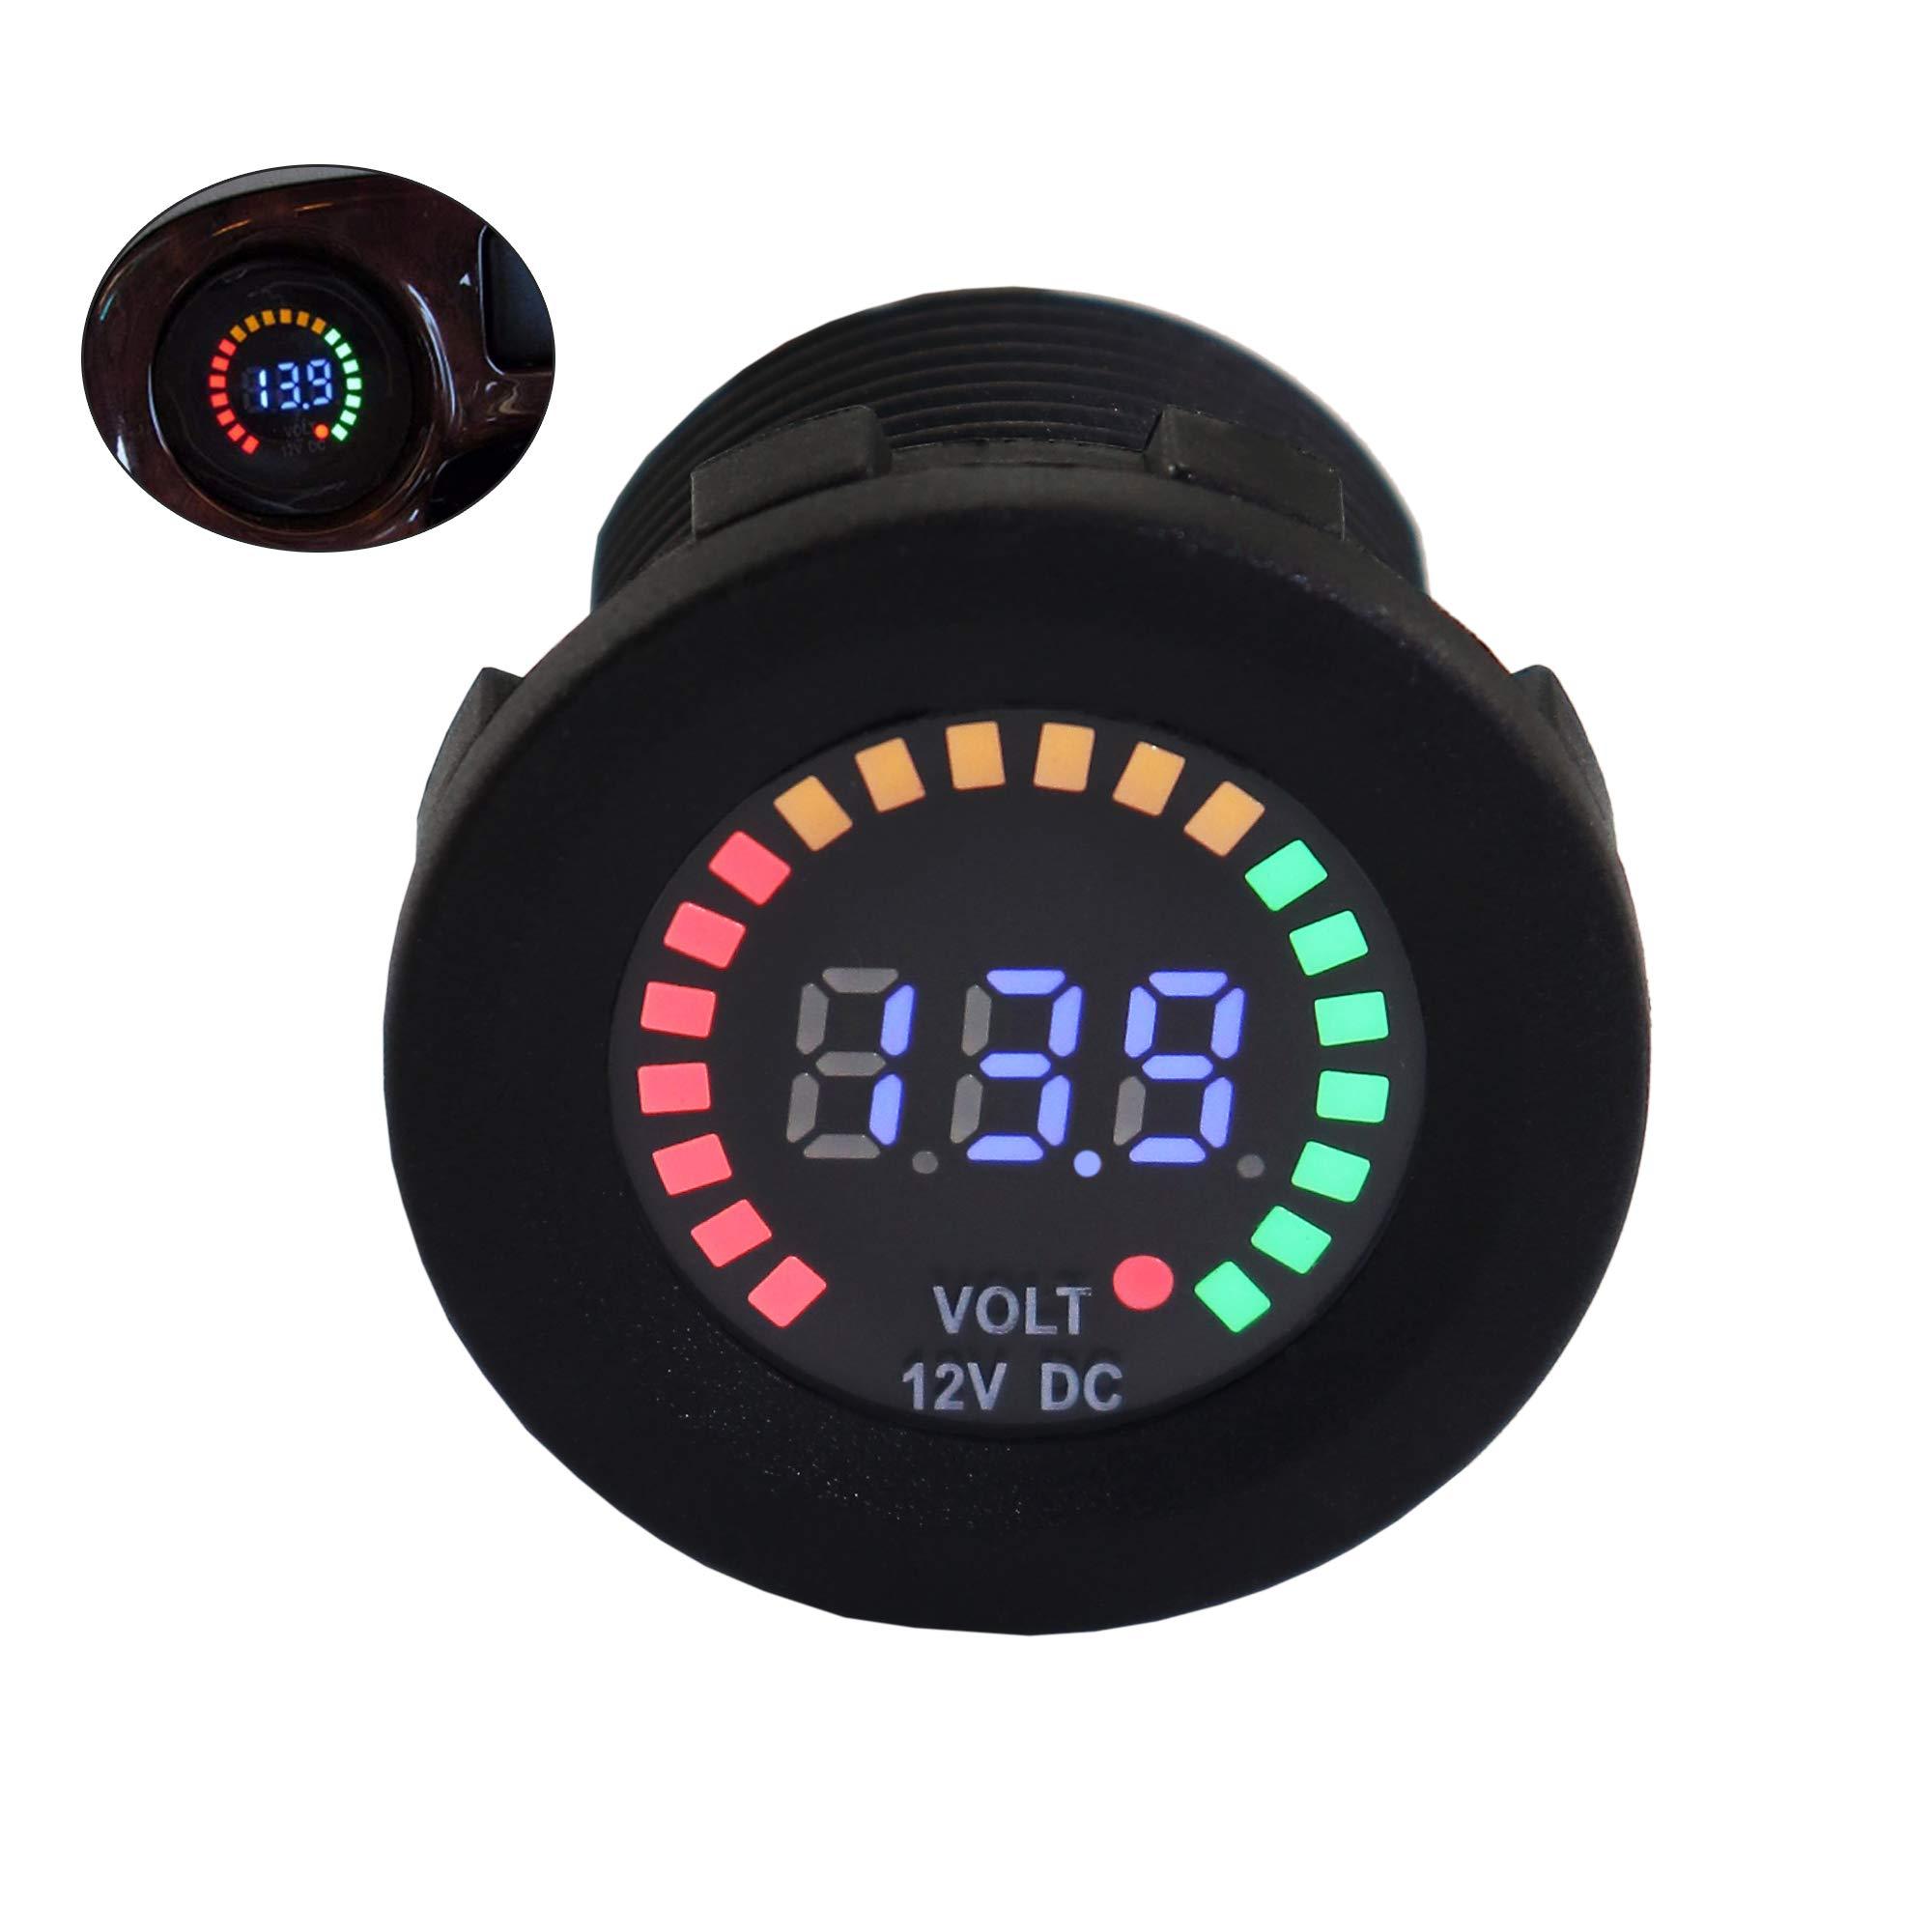 Waterproof battery meter 12V DC Voltmeter LED Digital Display Voltage Gauge Battery Tester for Marine Car Truck Boat RV by Jeemitery